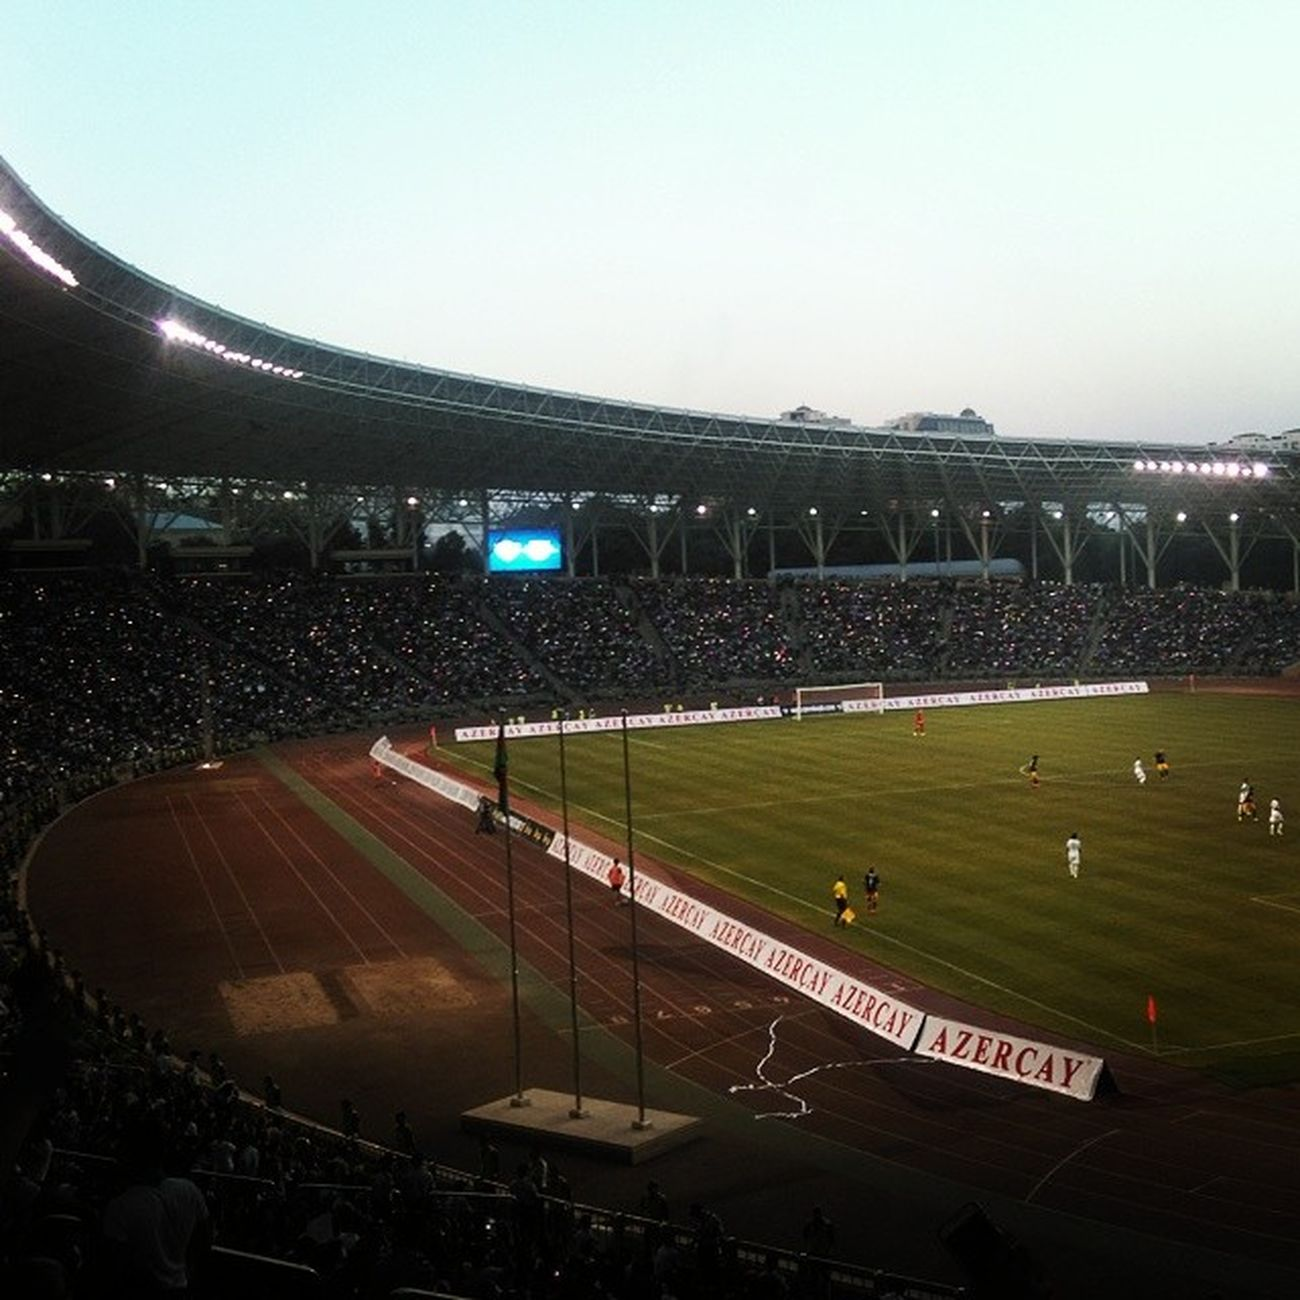 Qarabağ vs Salzburg Champions League UCL